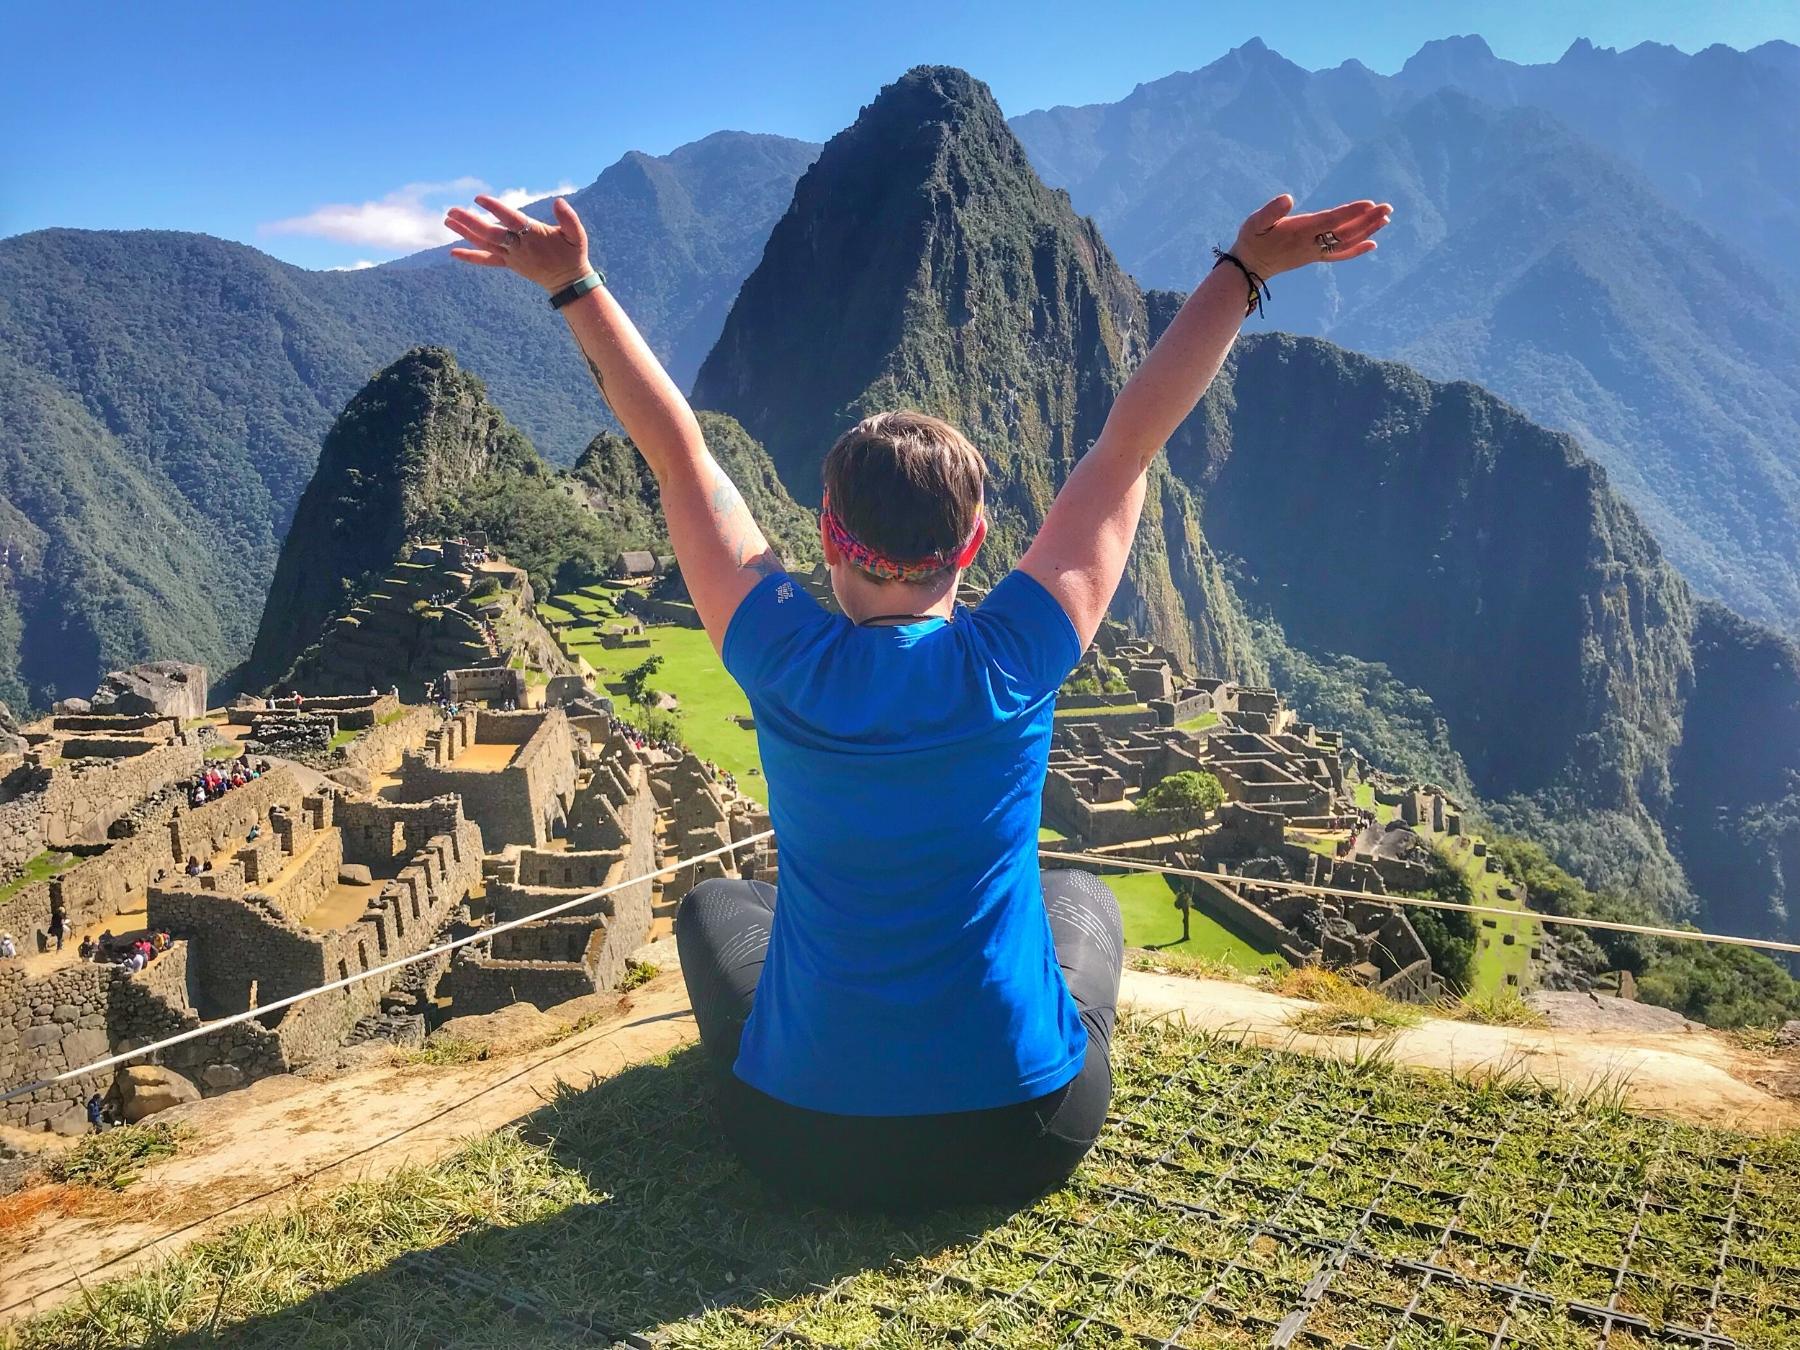 Photos that'll make you want to Hike the Salkantay Trek in Peru